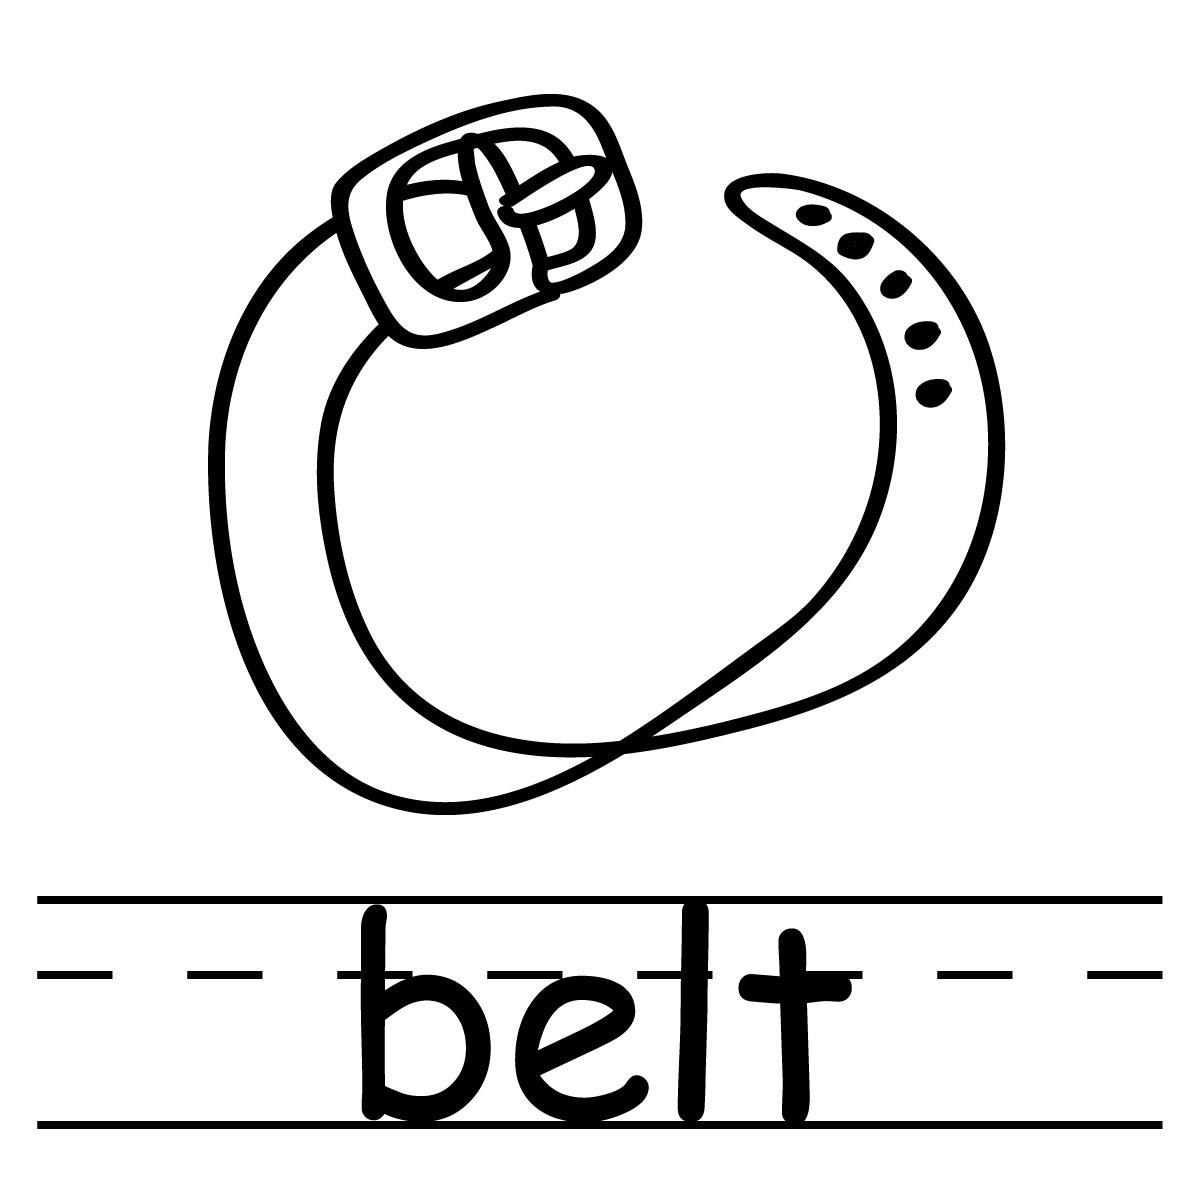 Belt of truth clipart 5 » Clipart Portal.